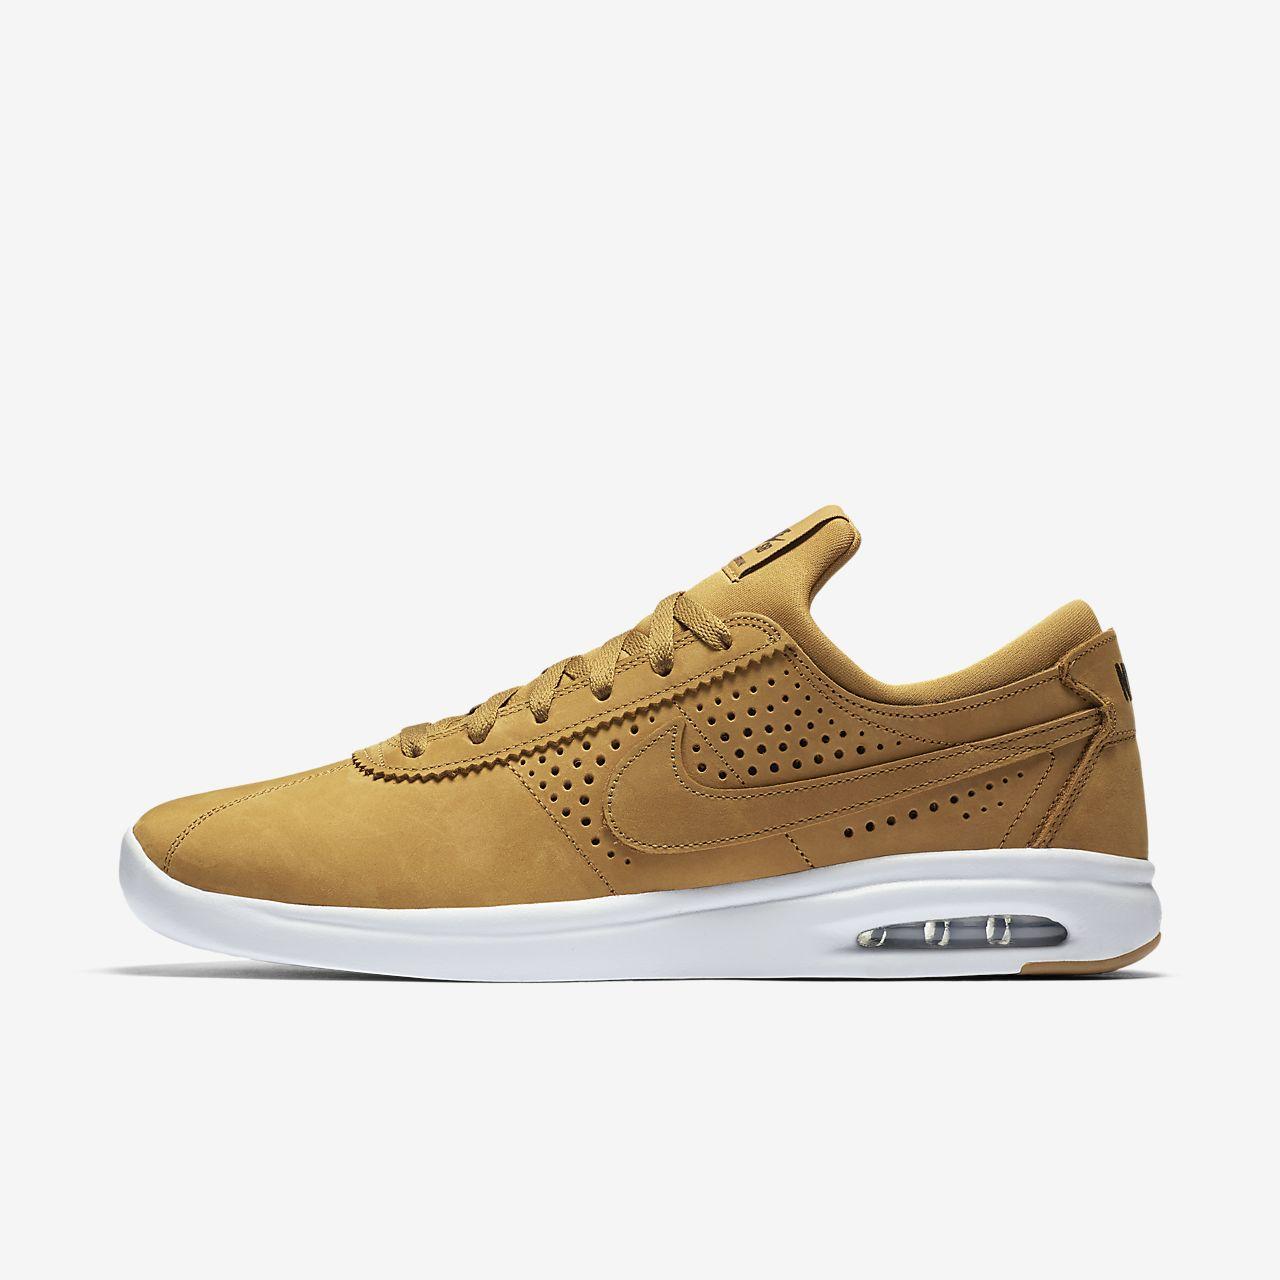 Brun Chaussures Nike Air Huarache Dans 47 Hommes k2d8ng